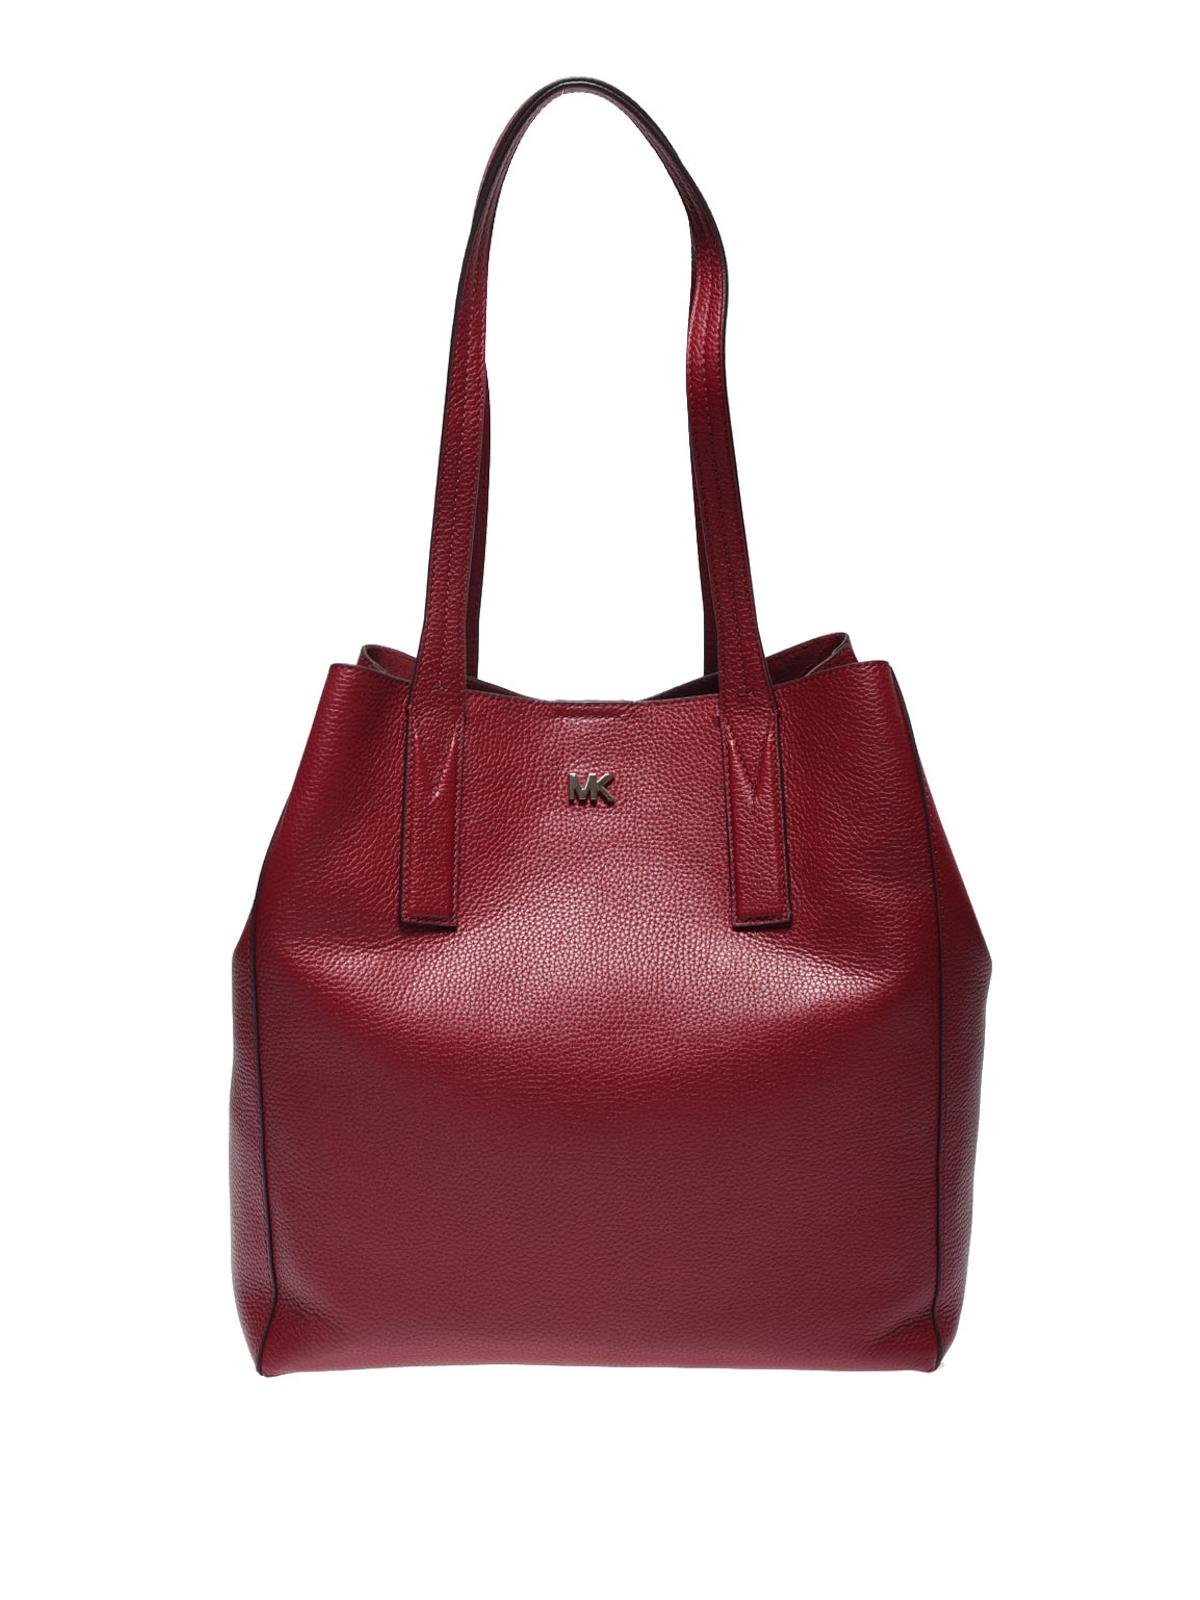 9493861fae8801 Michael Kors - Junie maroon leather large tote - totes bags ...